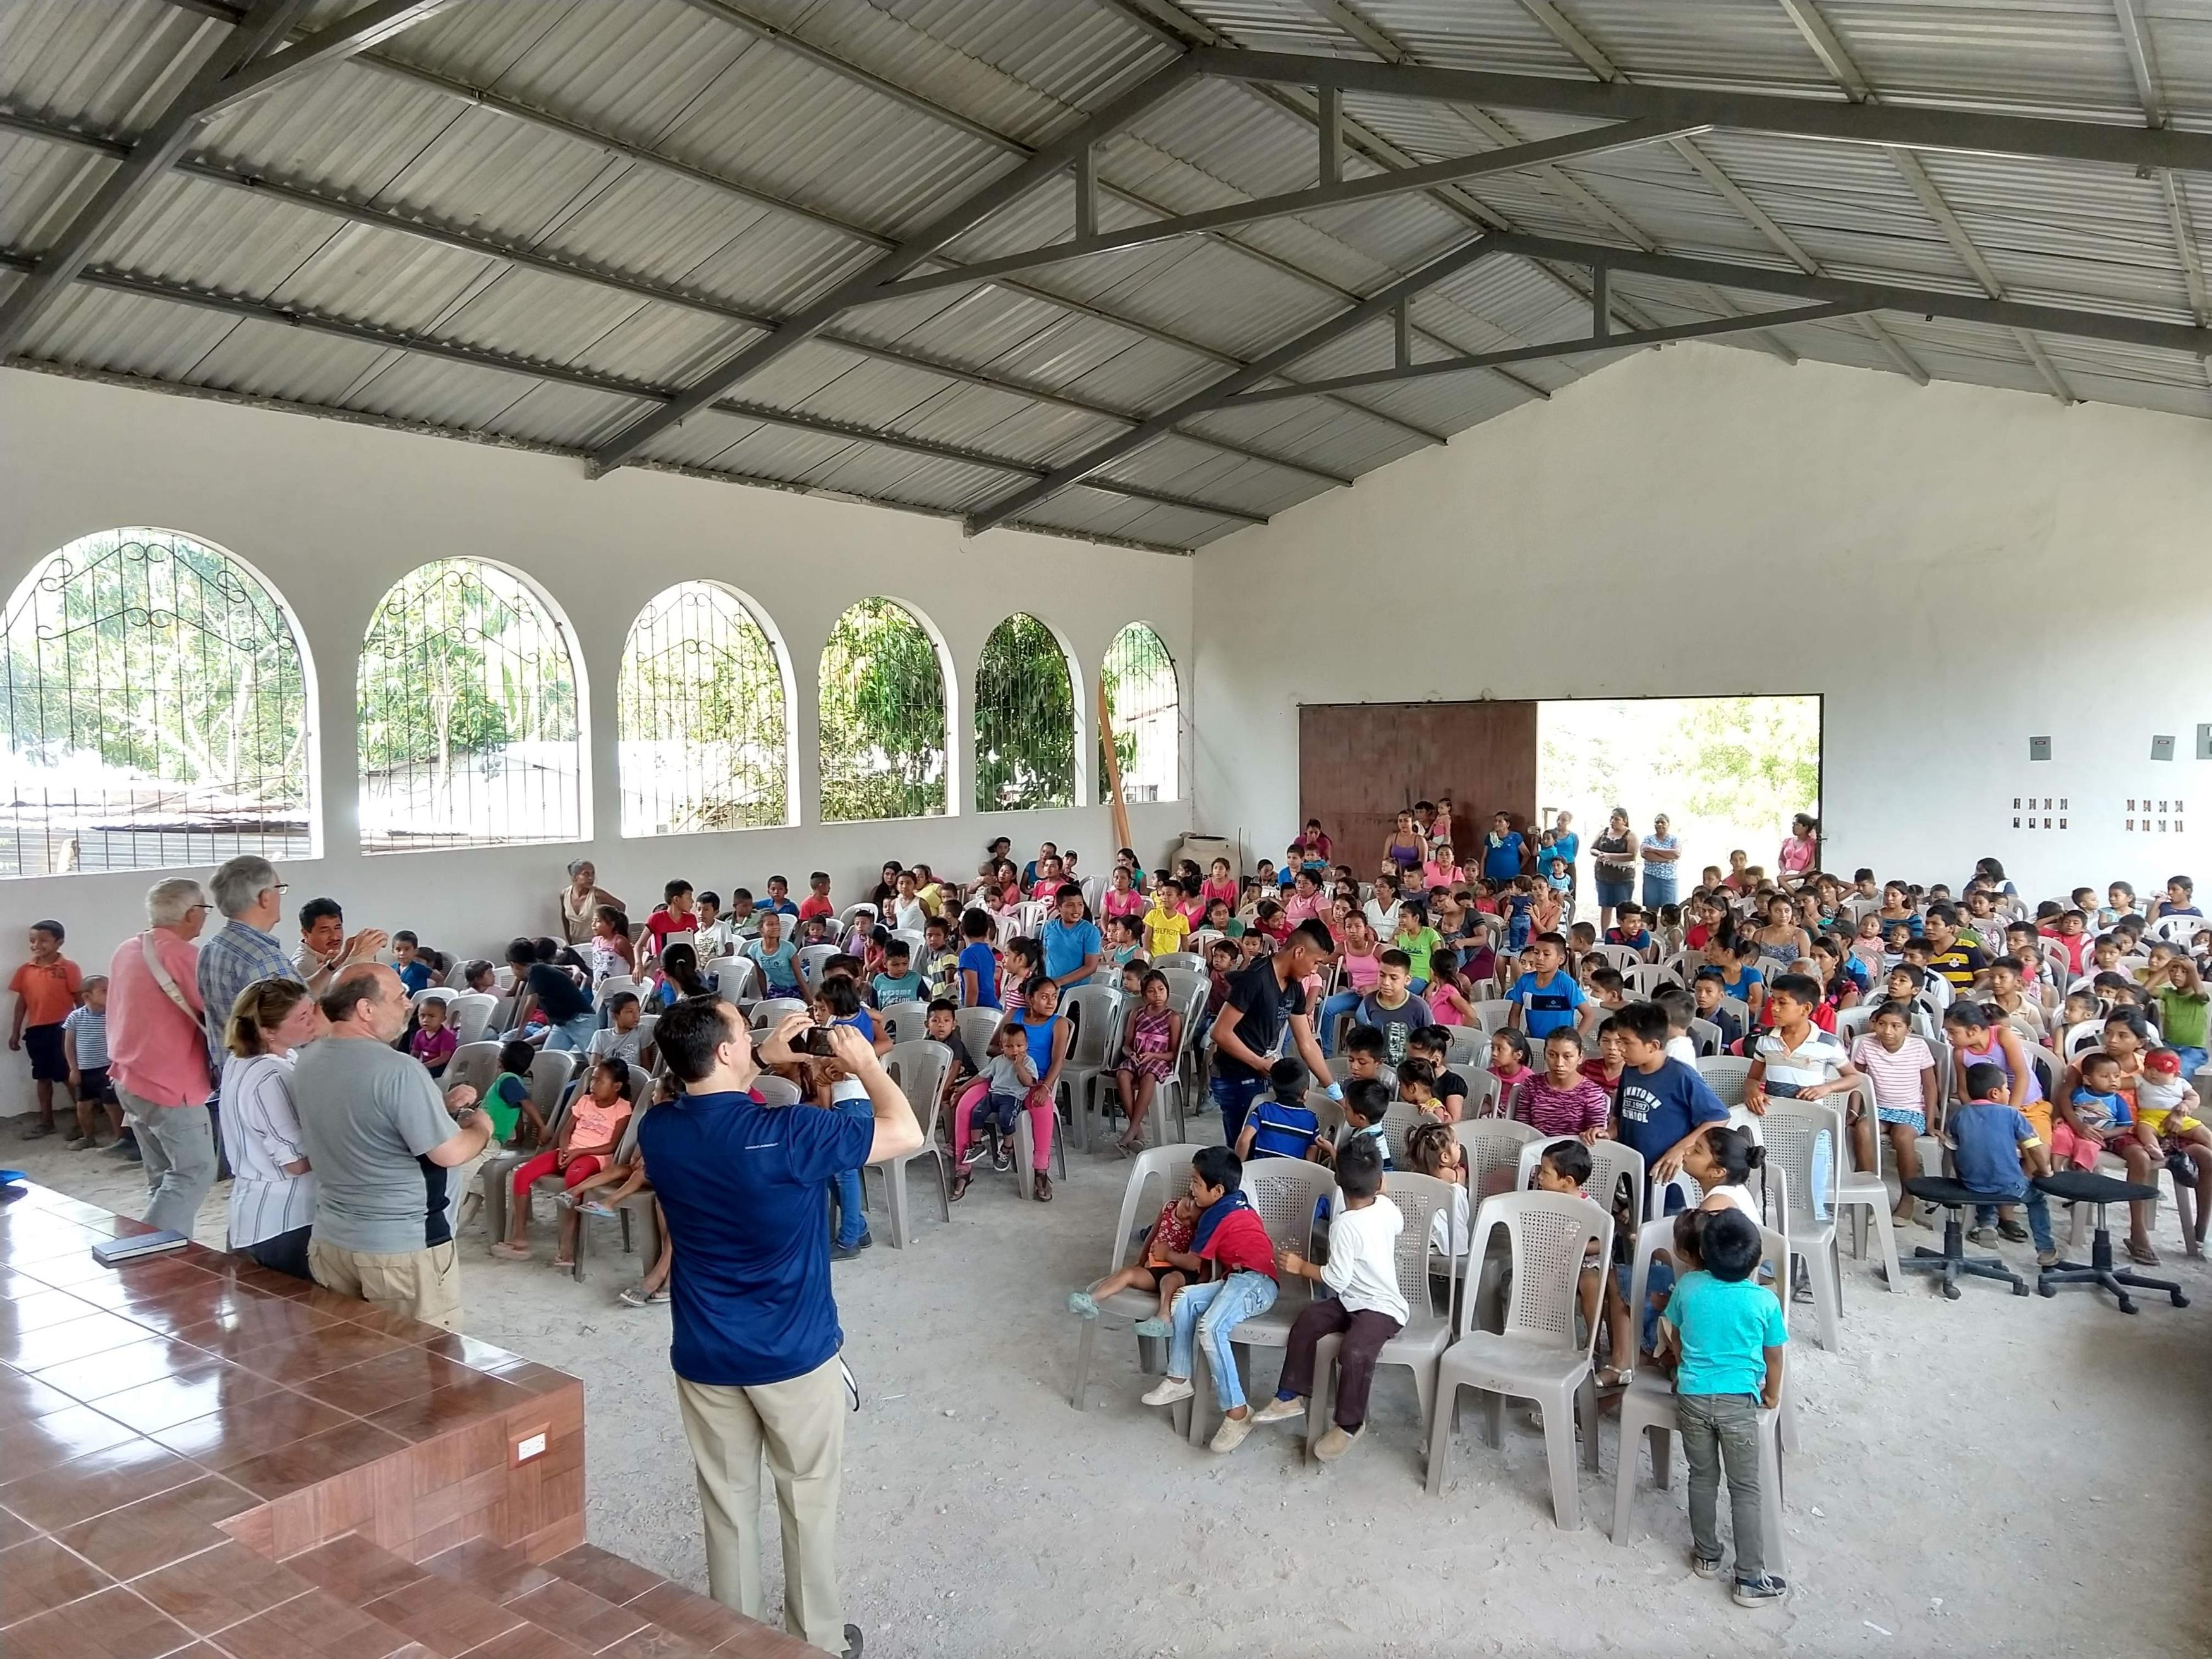 Pastor Steve Wheeler at a church gathering in Guatemala